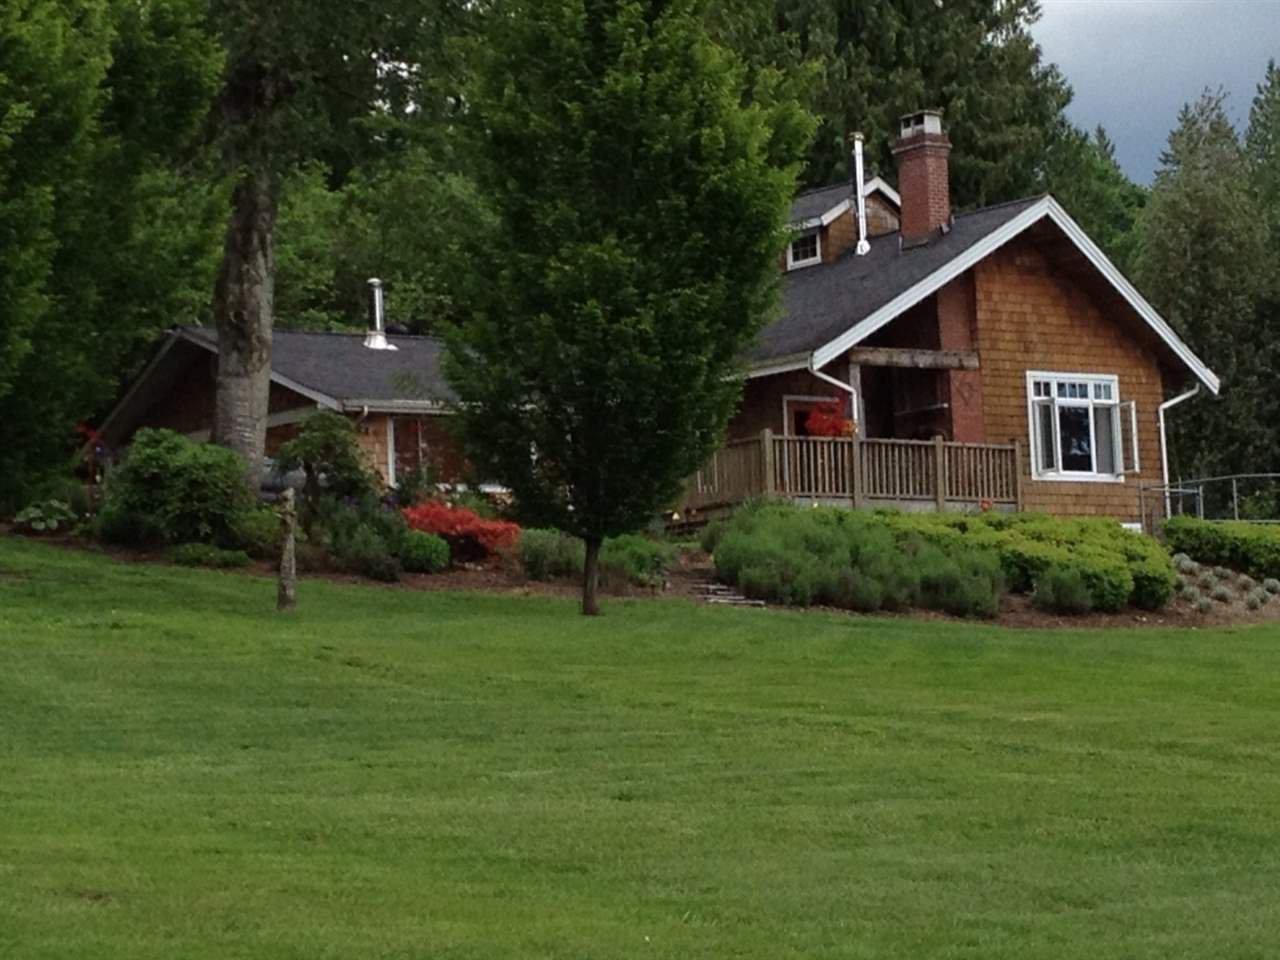 Main Photo: 26749 98 Avenue in Maple Ridge: Thornhill House for sale : MLS®# R2039037